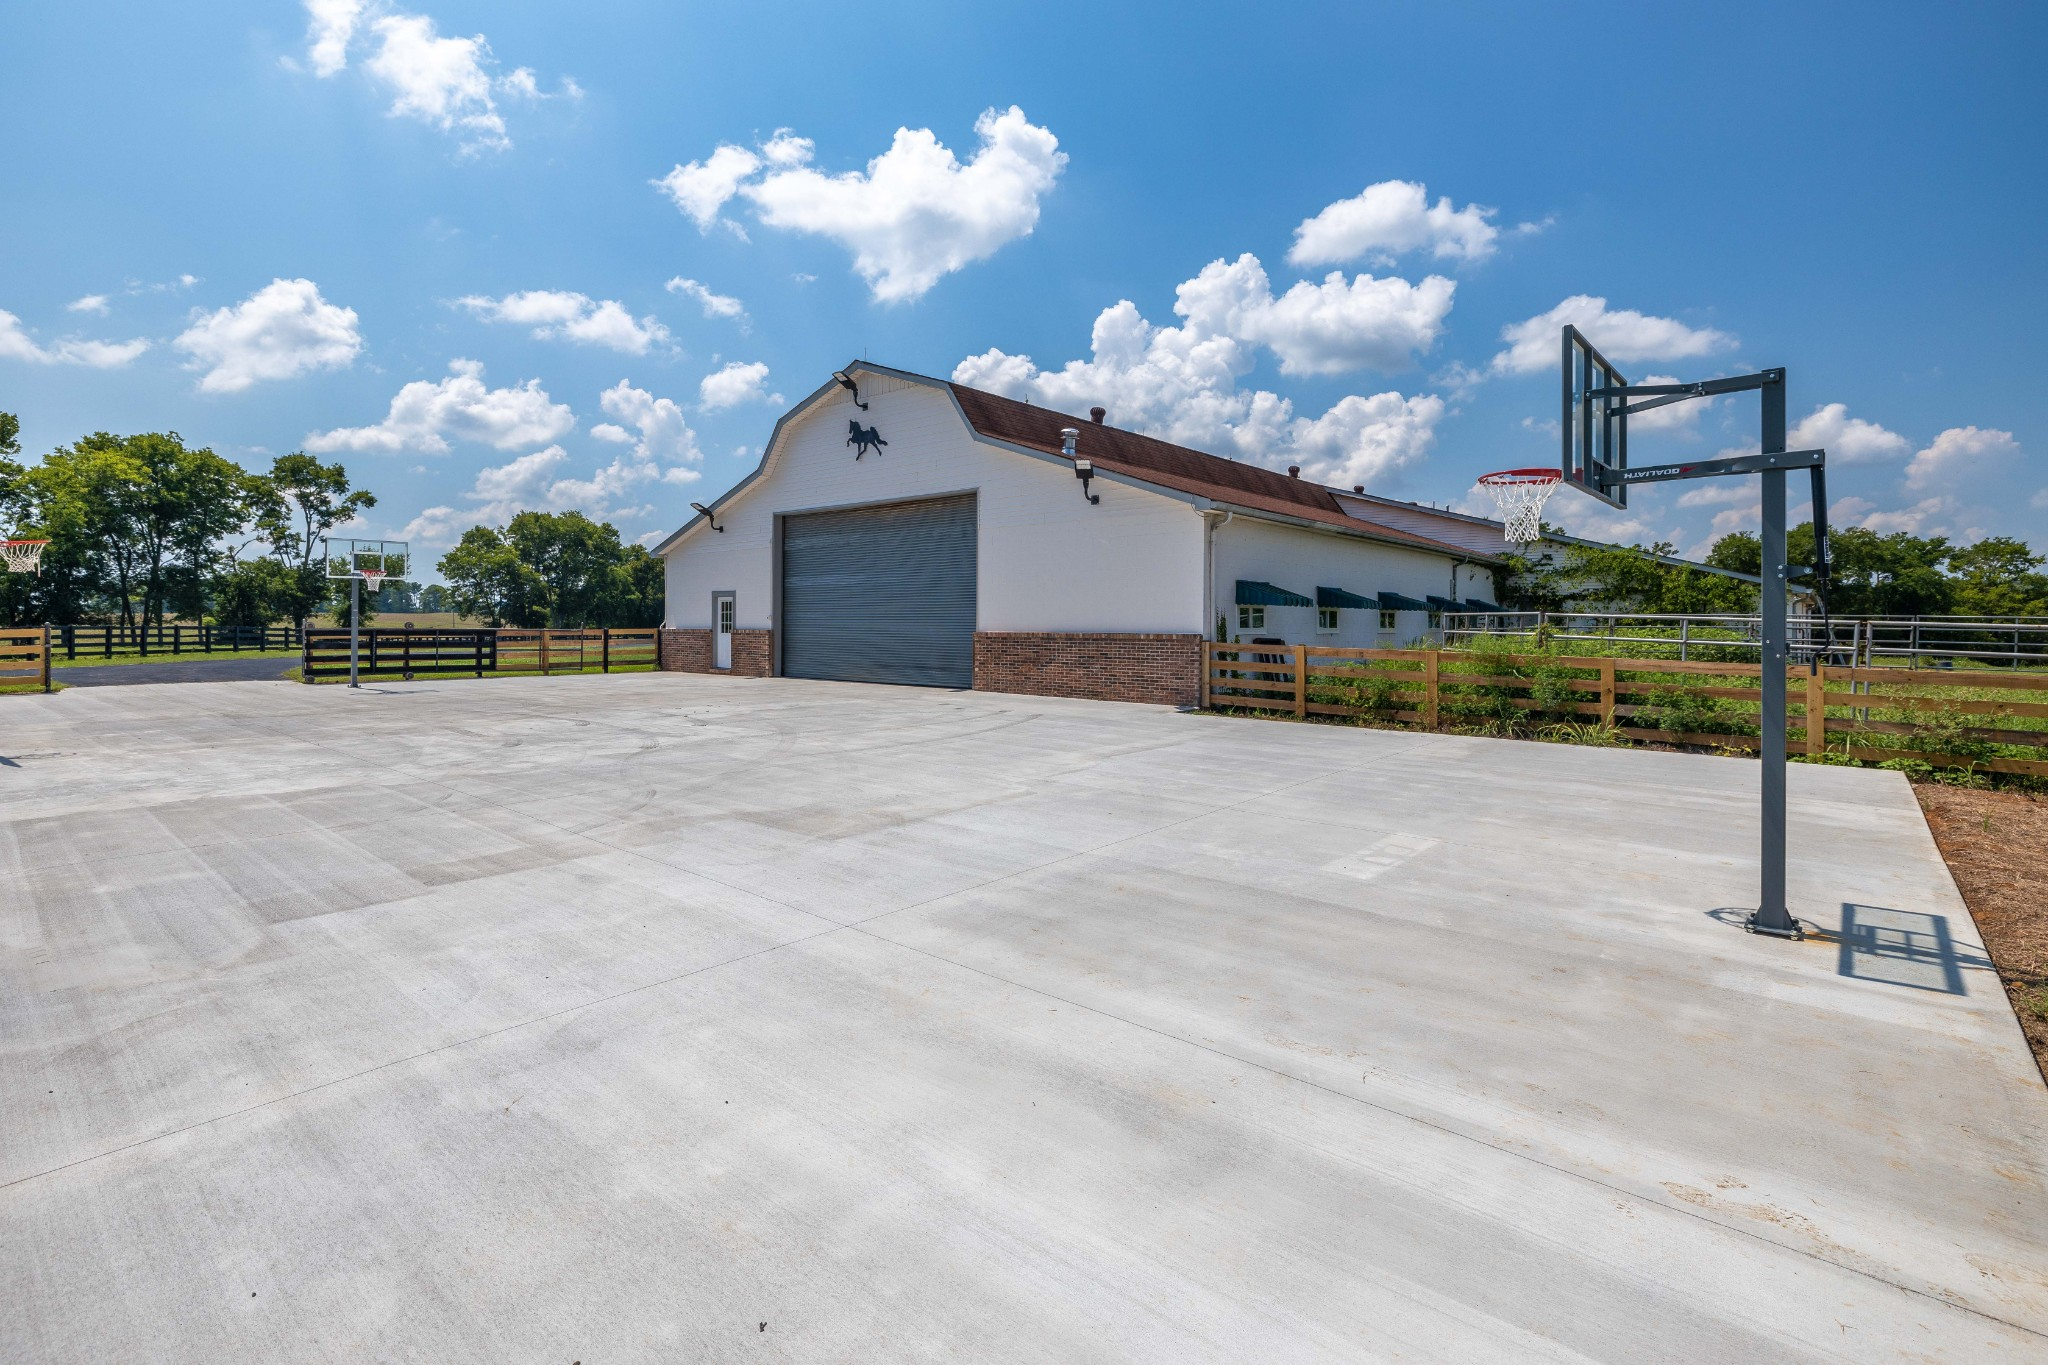 607 Sunnyside Ln Property Photo 31